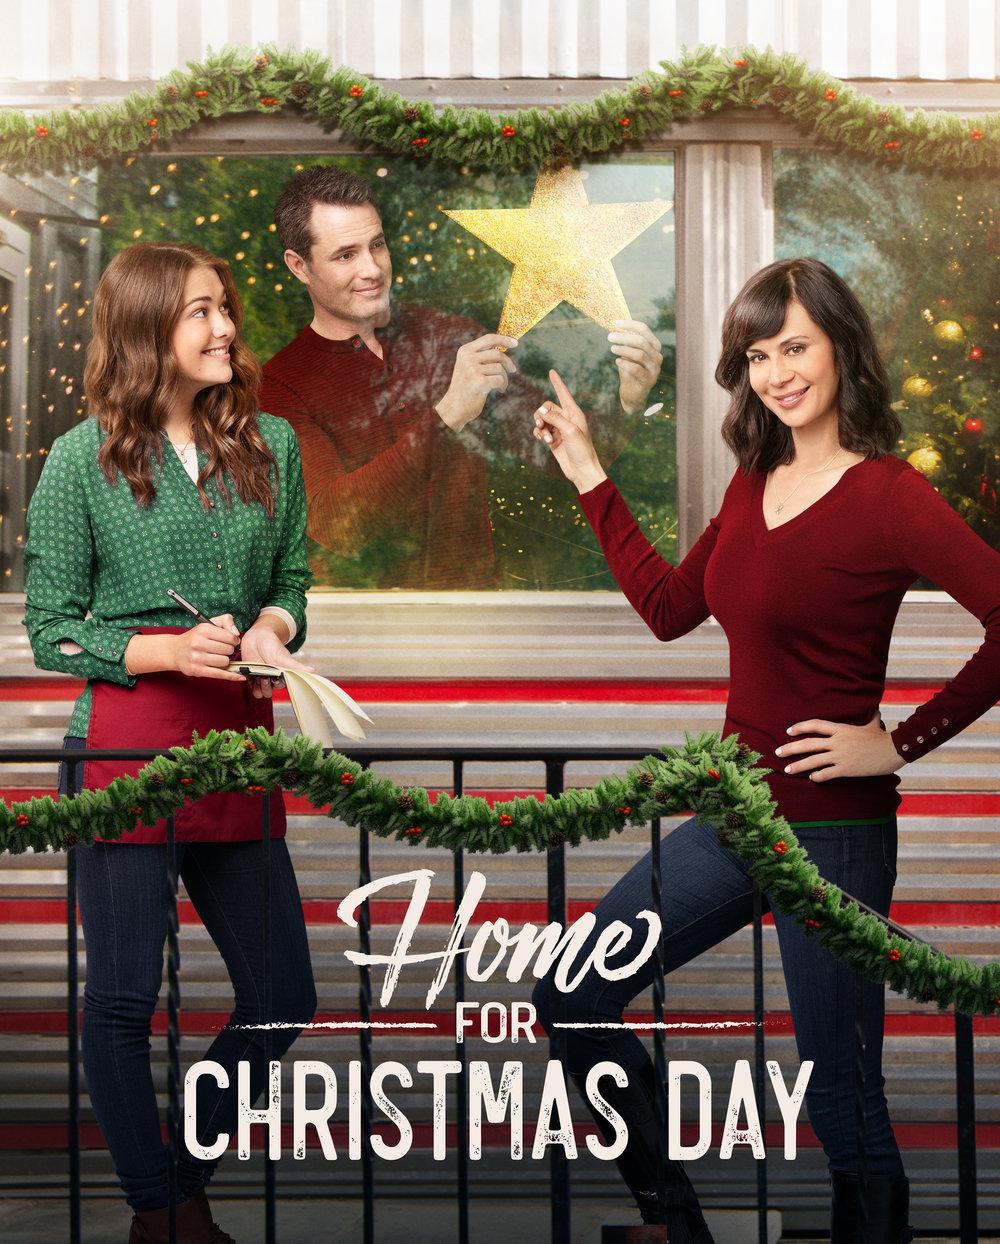 HOME FOR CHRISTMAS DAY